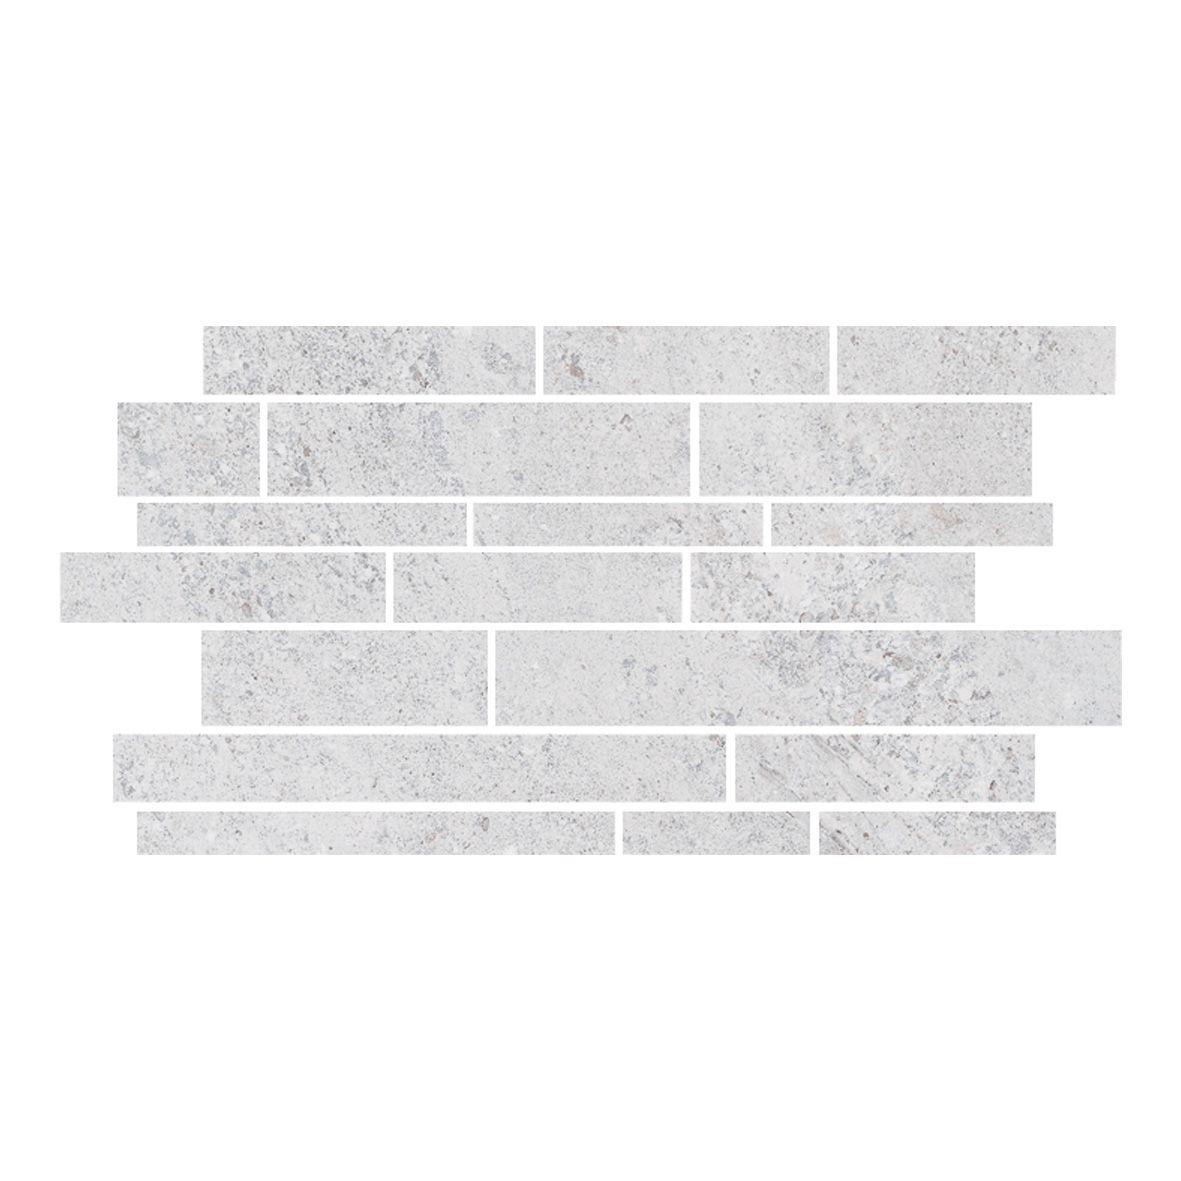 Gemini Hillock Light Grey Brick Mosaic Bathroom, Kitchen, Wetroom ...